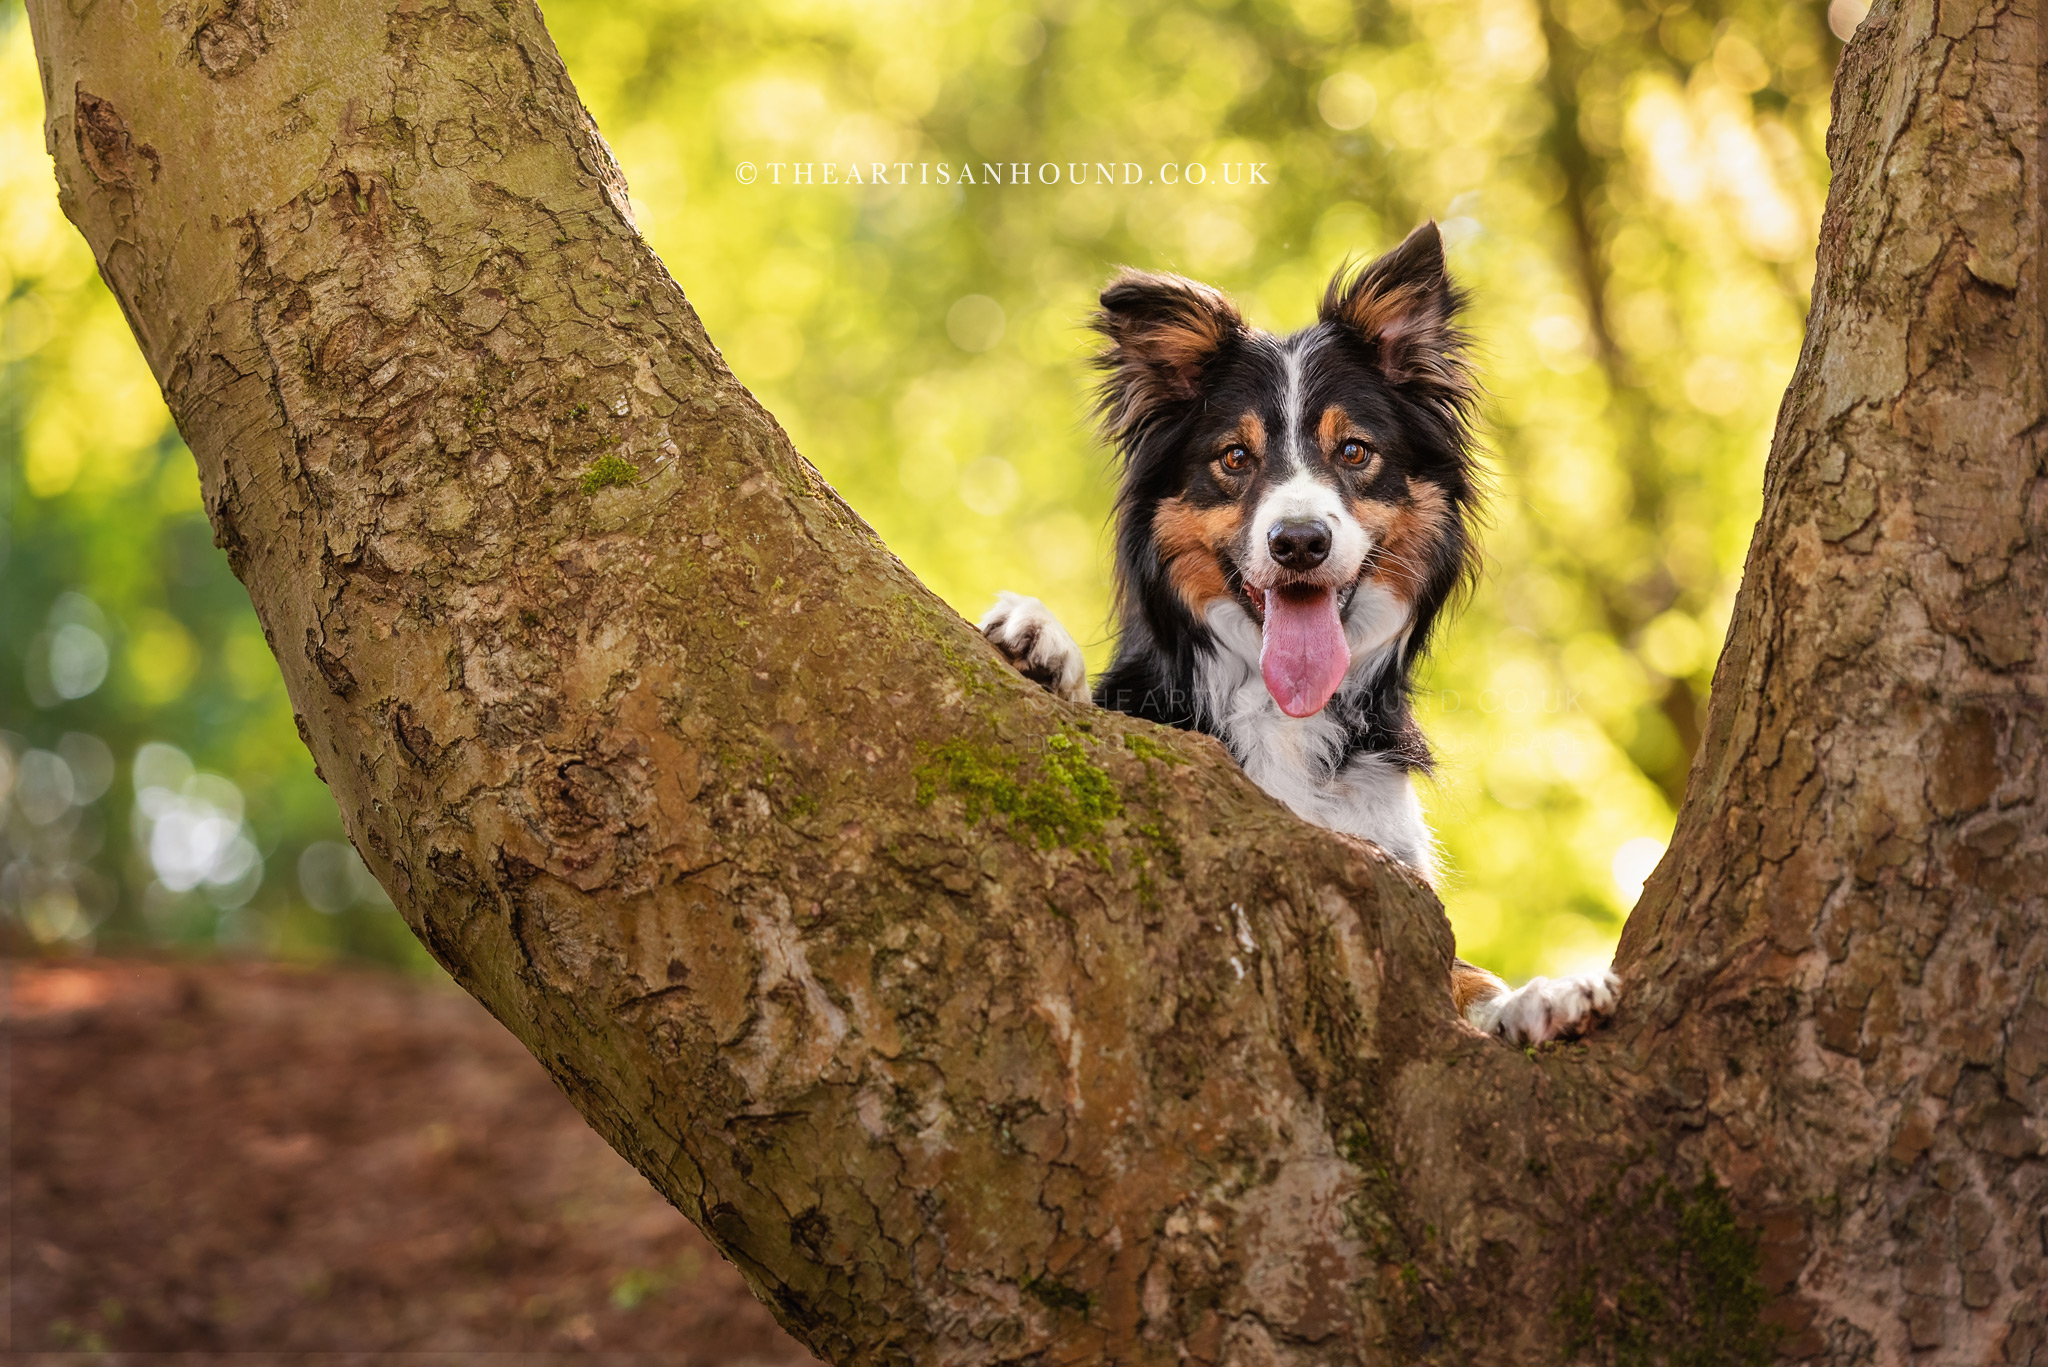 Border Collie dog peeking through gap in tree